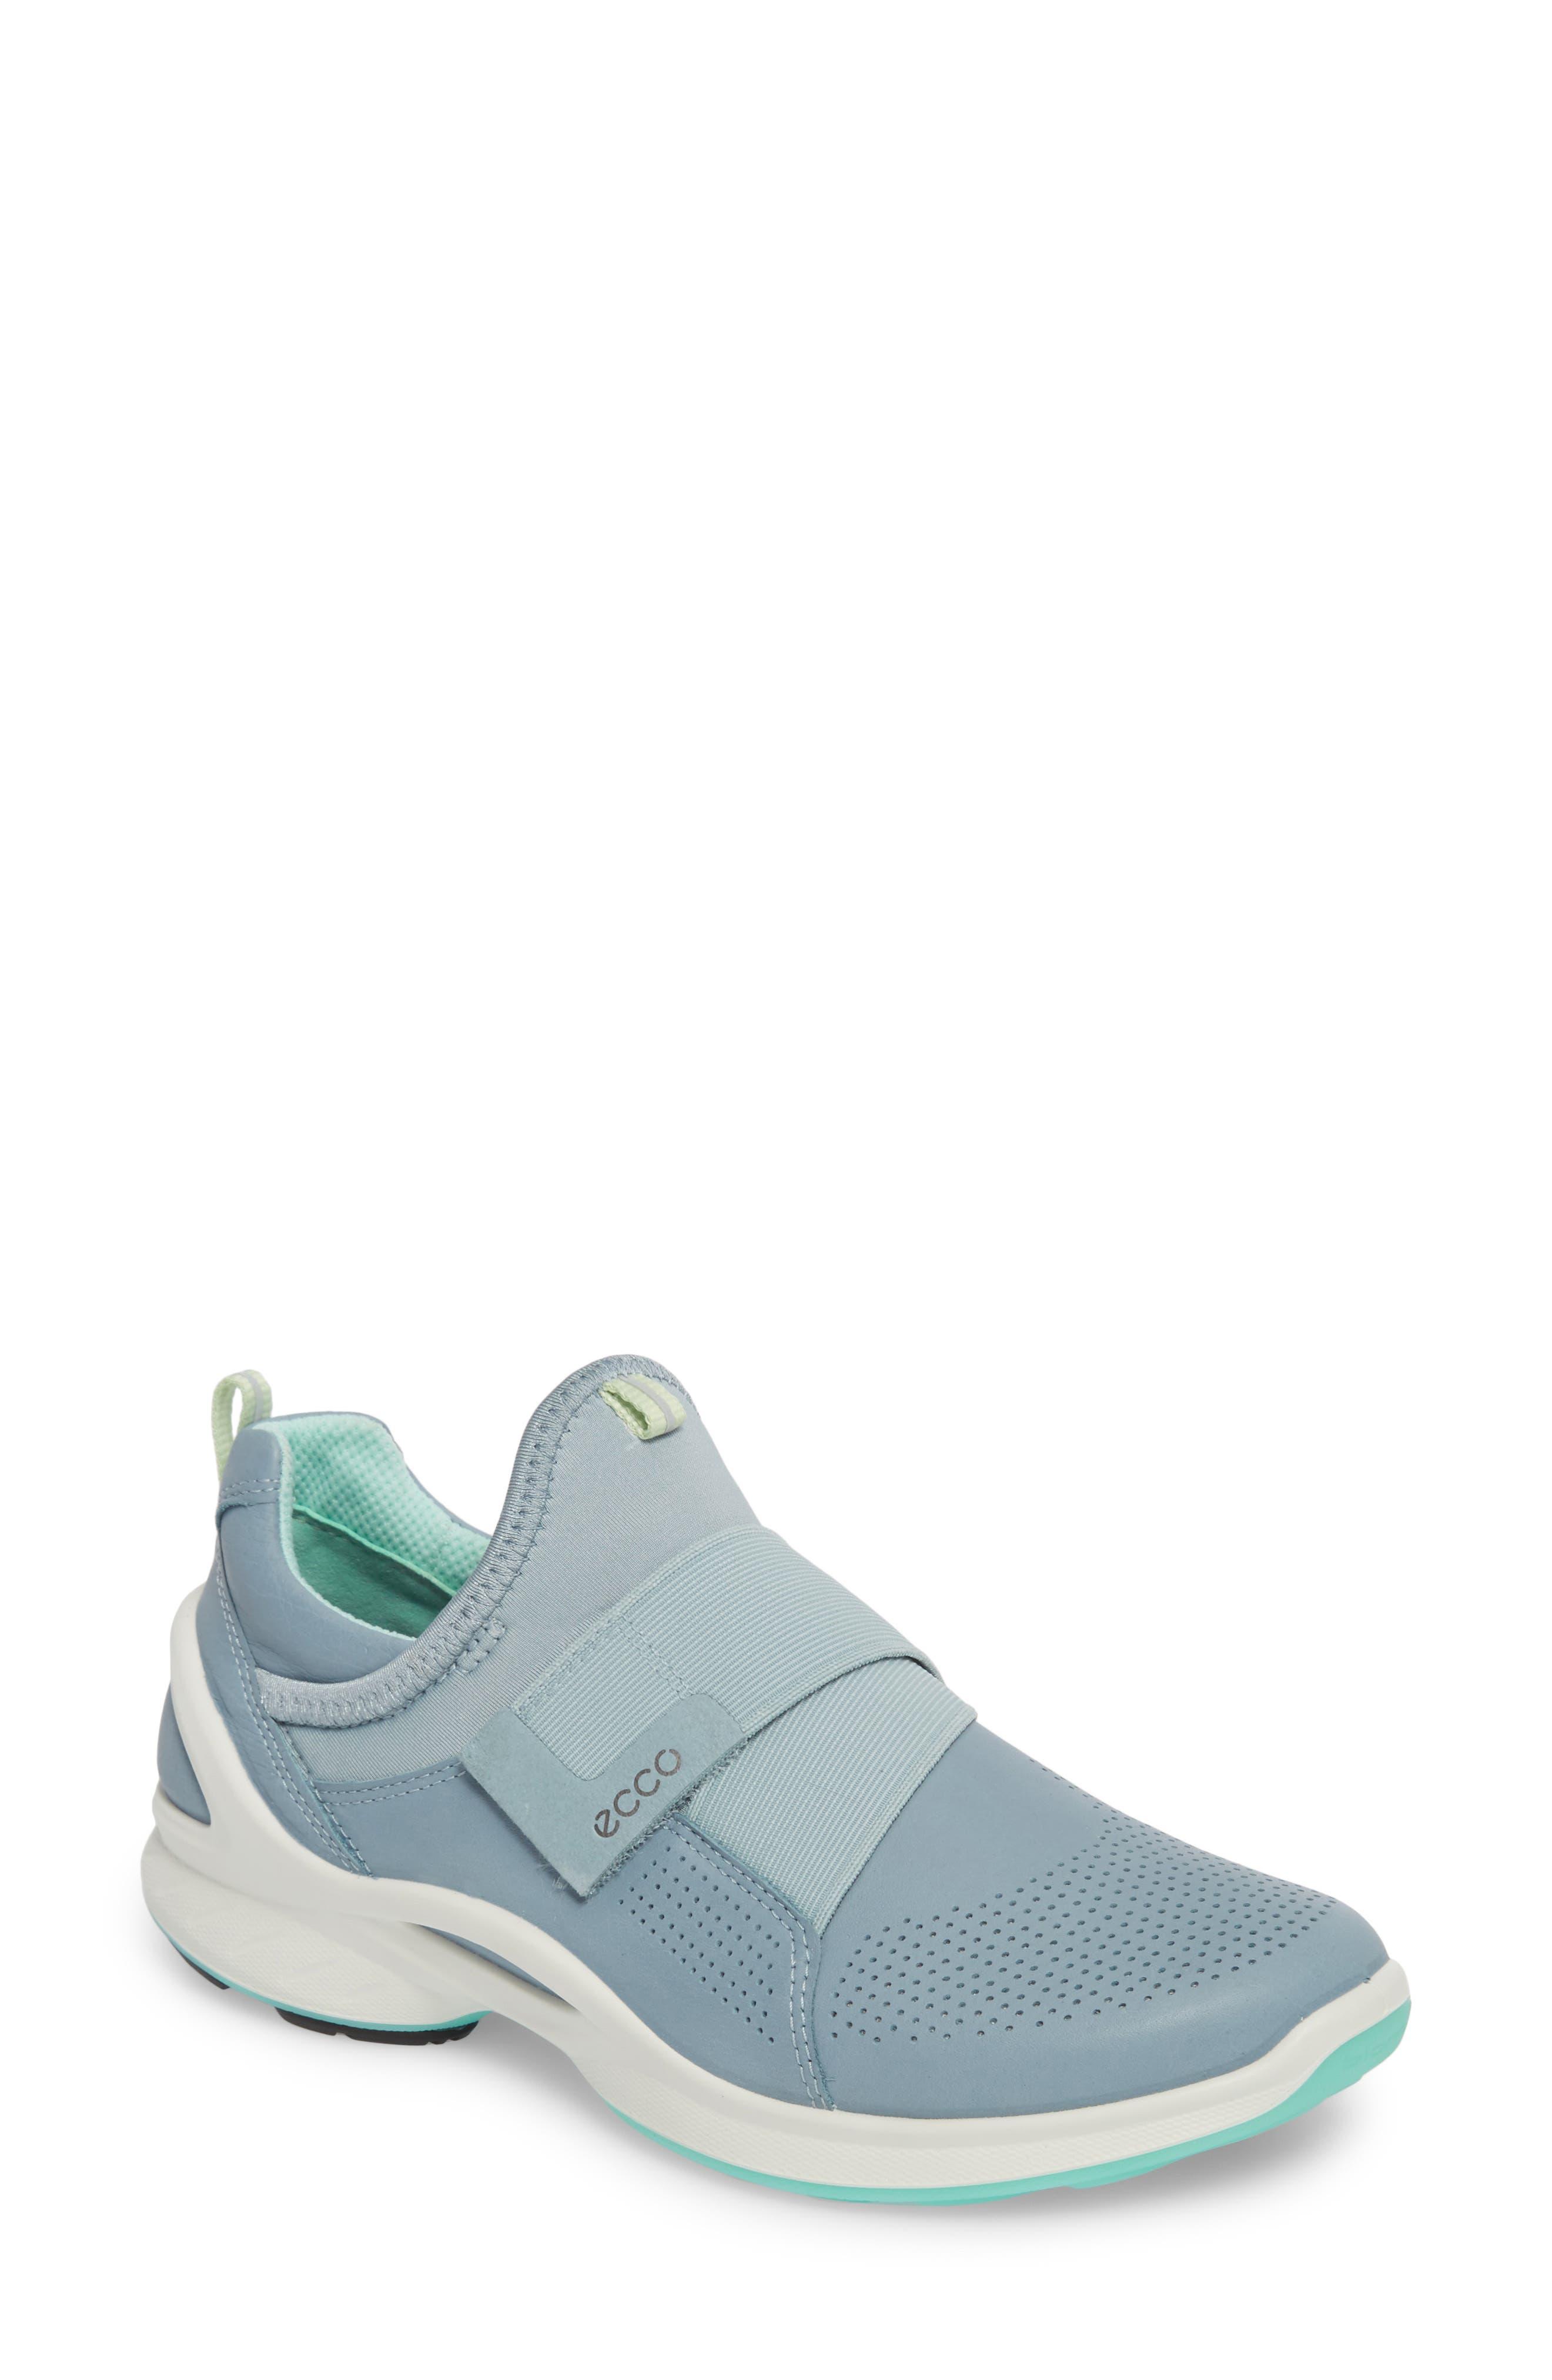 BIOM Fjuel Band Sneaker,                             Main thumbnail 1, color,                             Arona Fabric